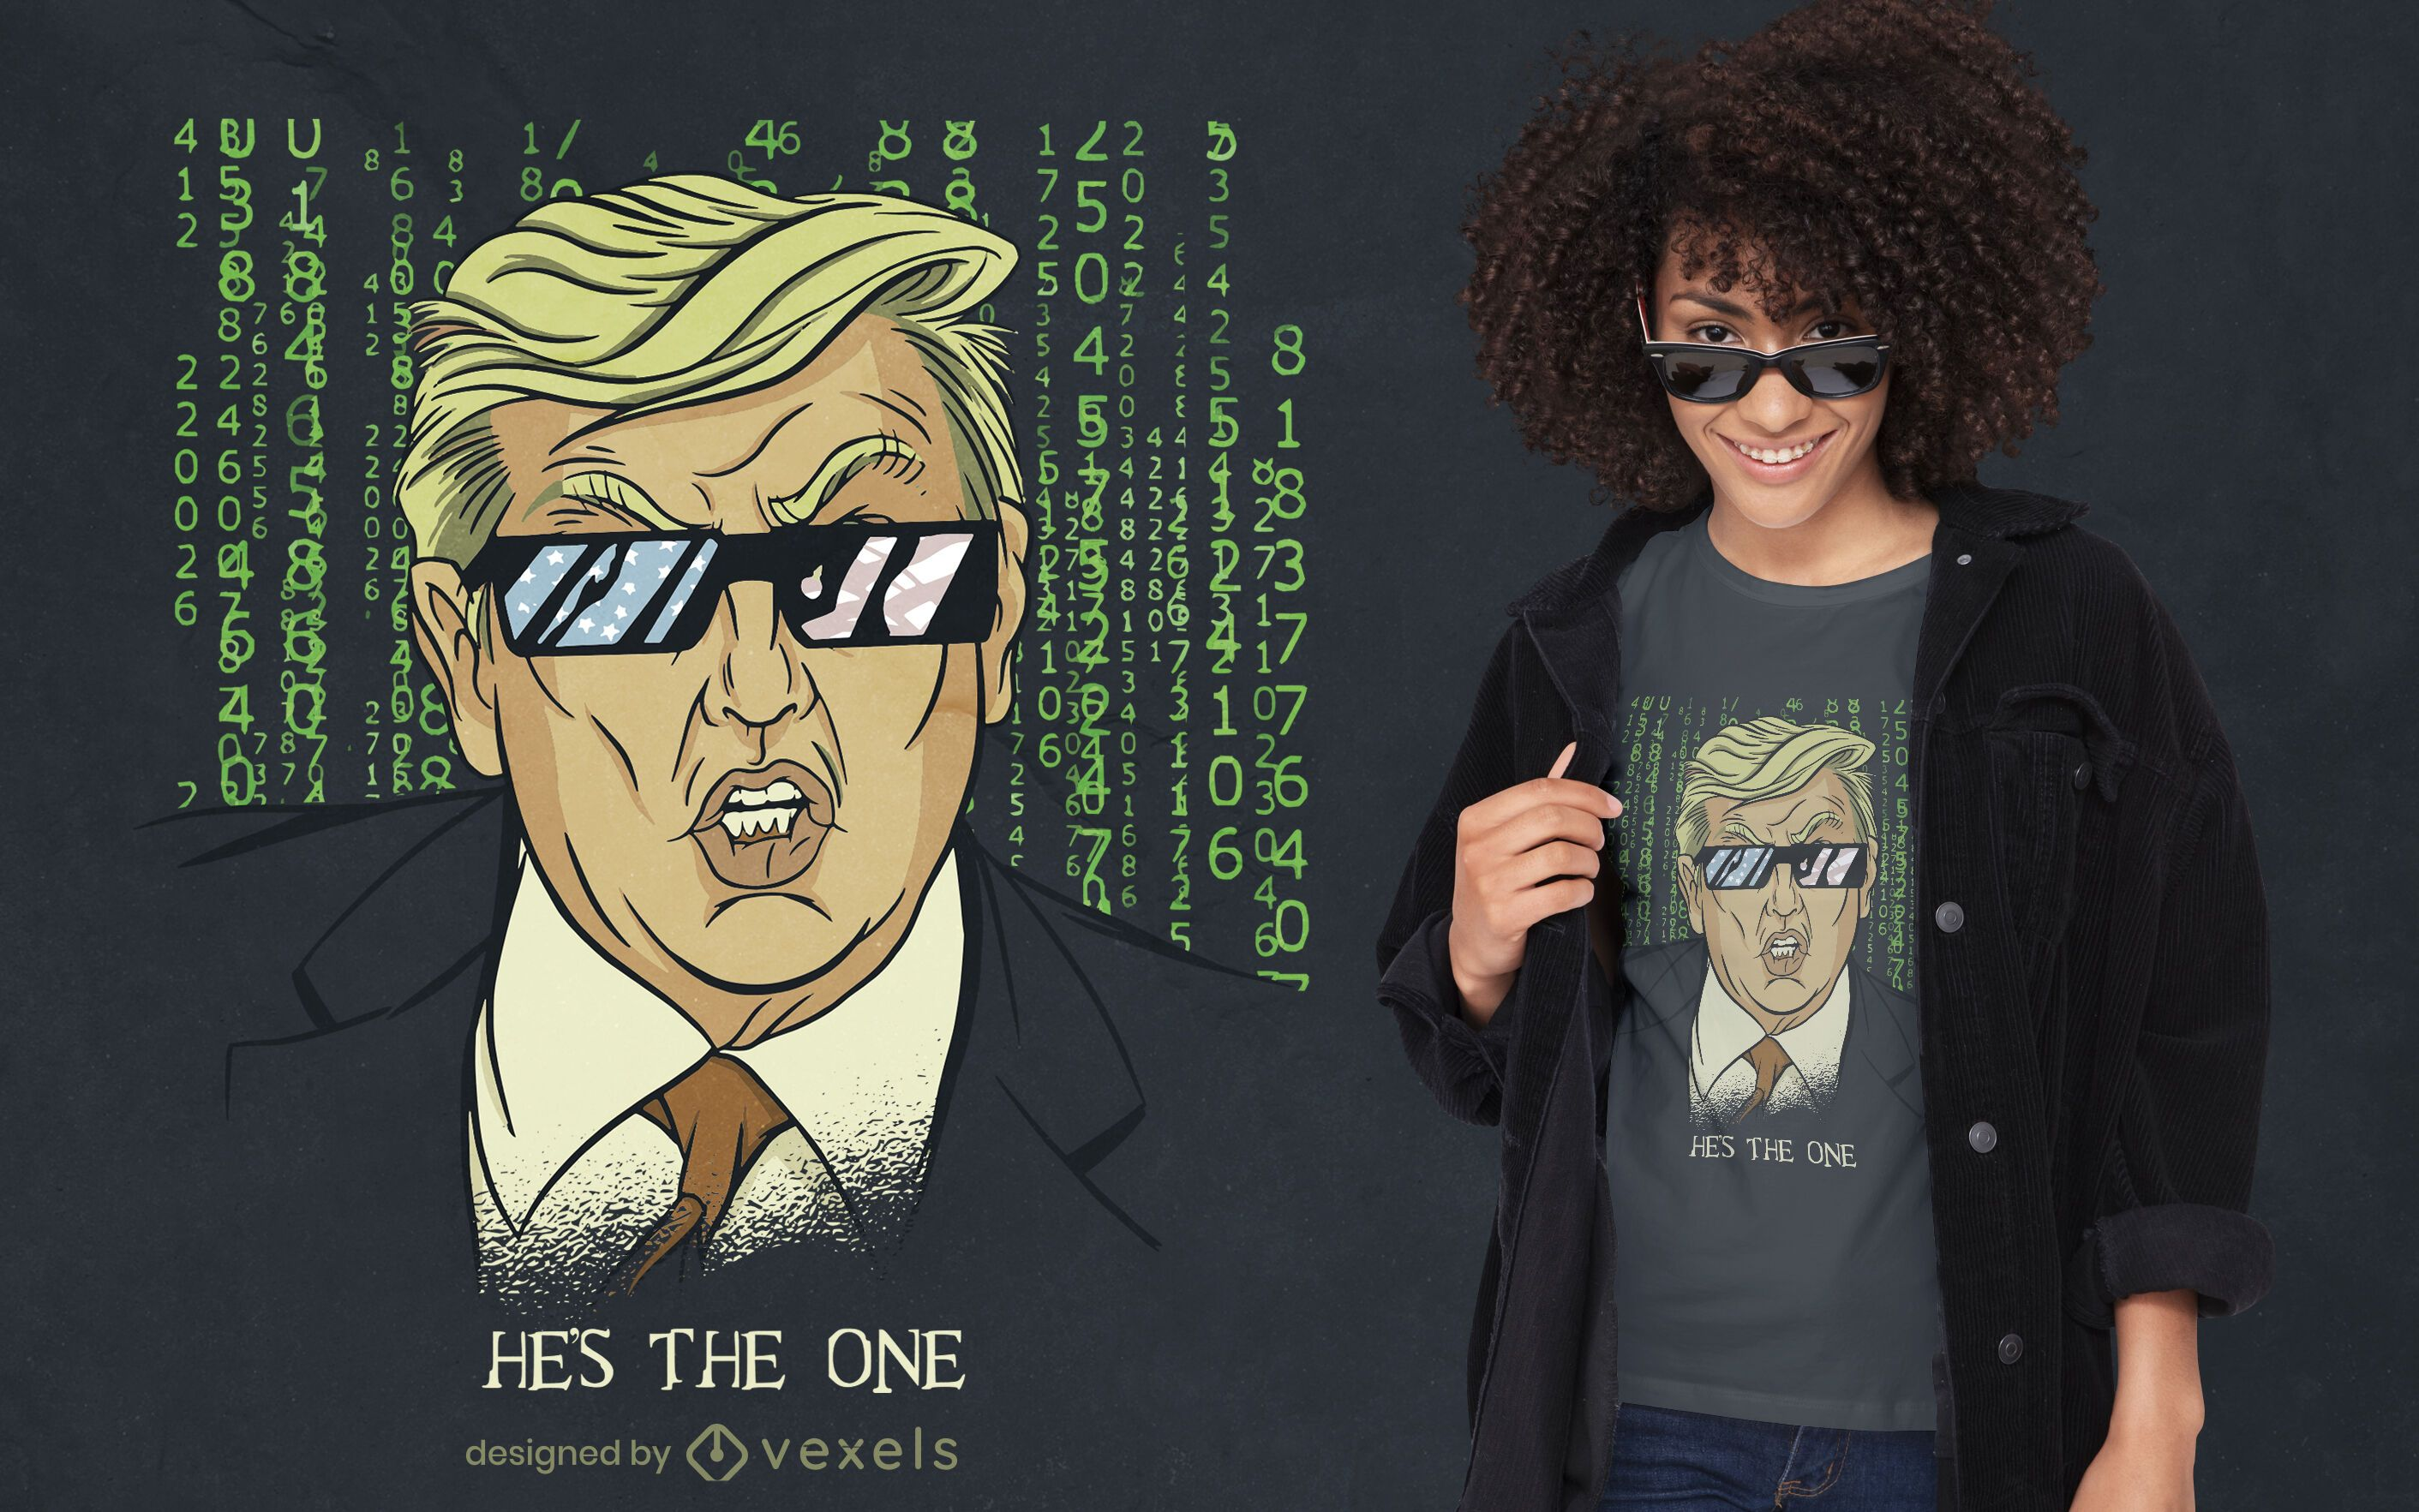 Diseño de camiseta estadounidense de parodia de Trump